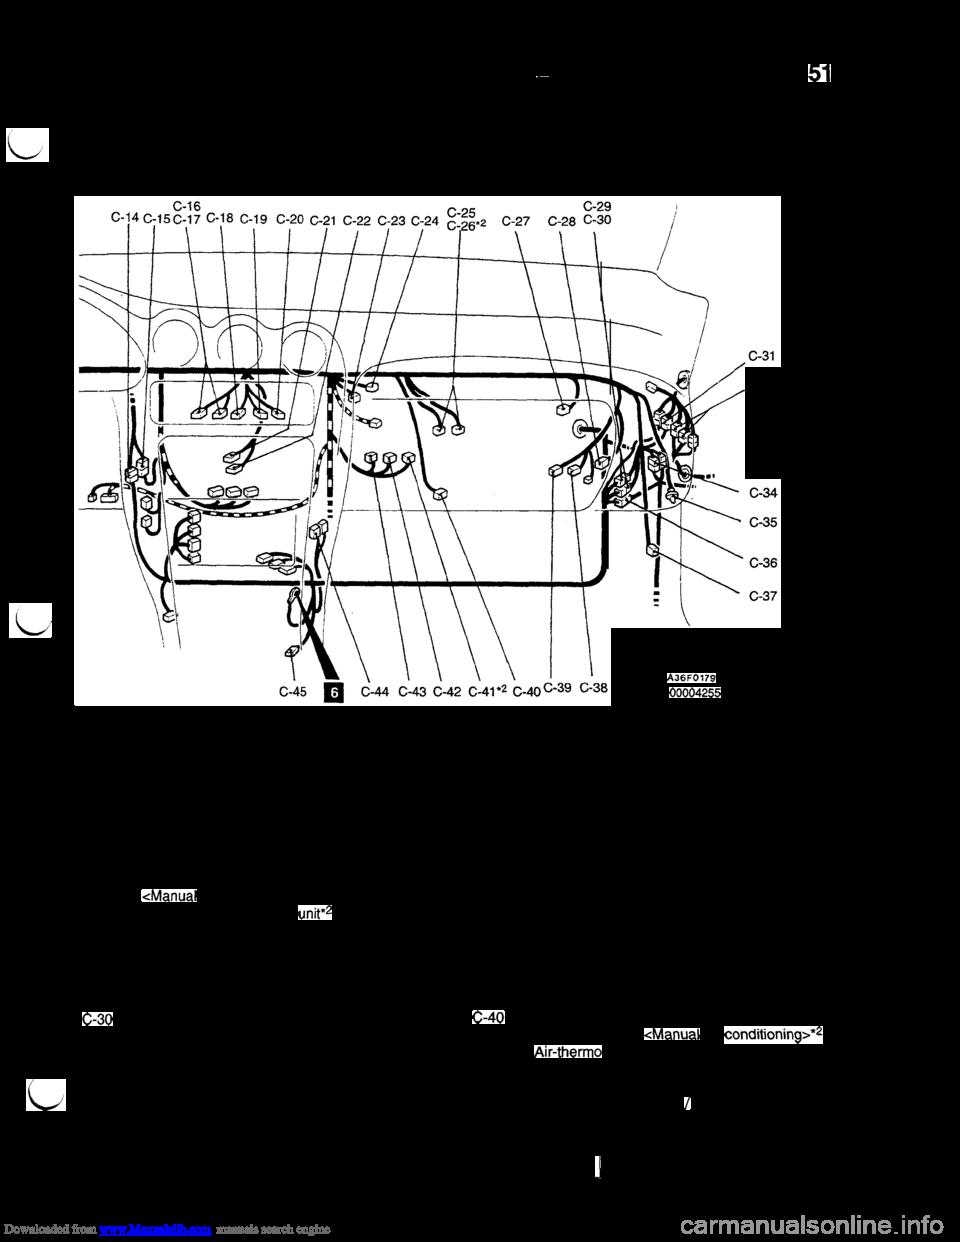 mitsubishi 3000gt 1994 2 g workshop manual, page 53